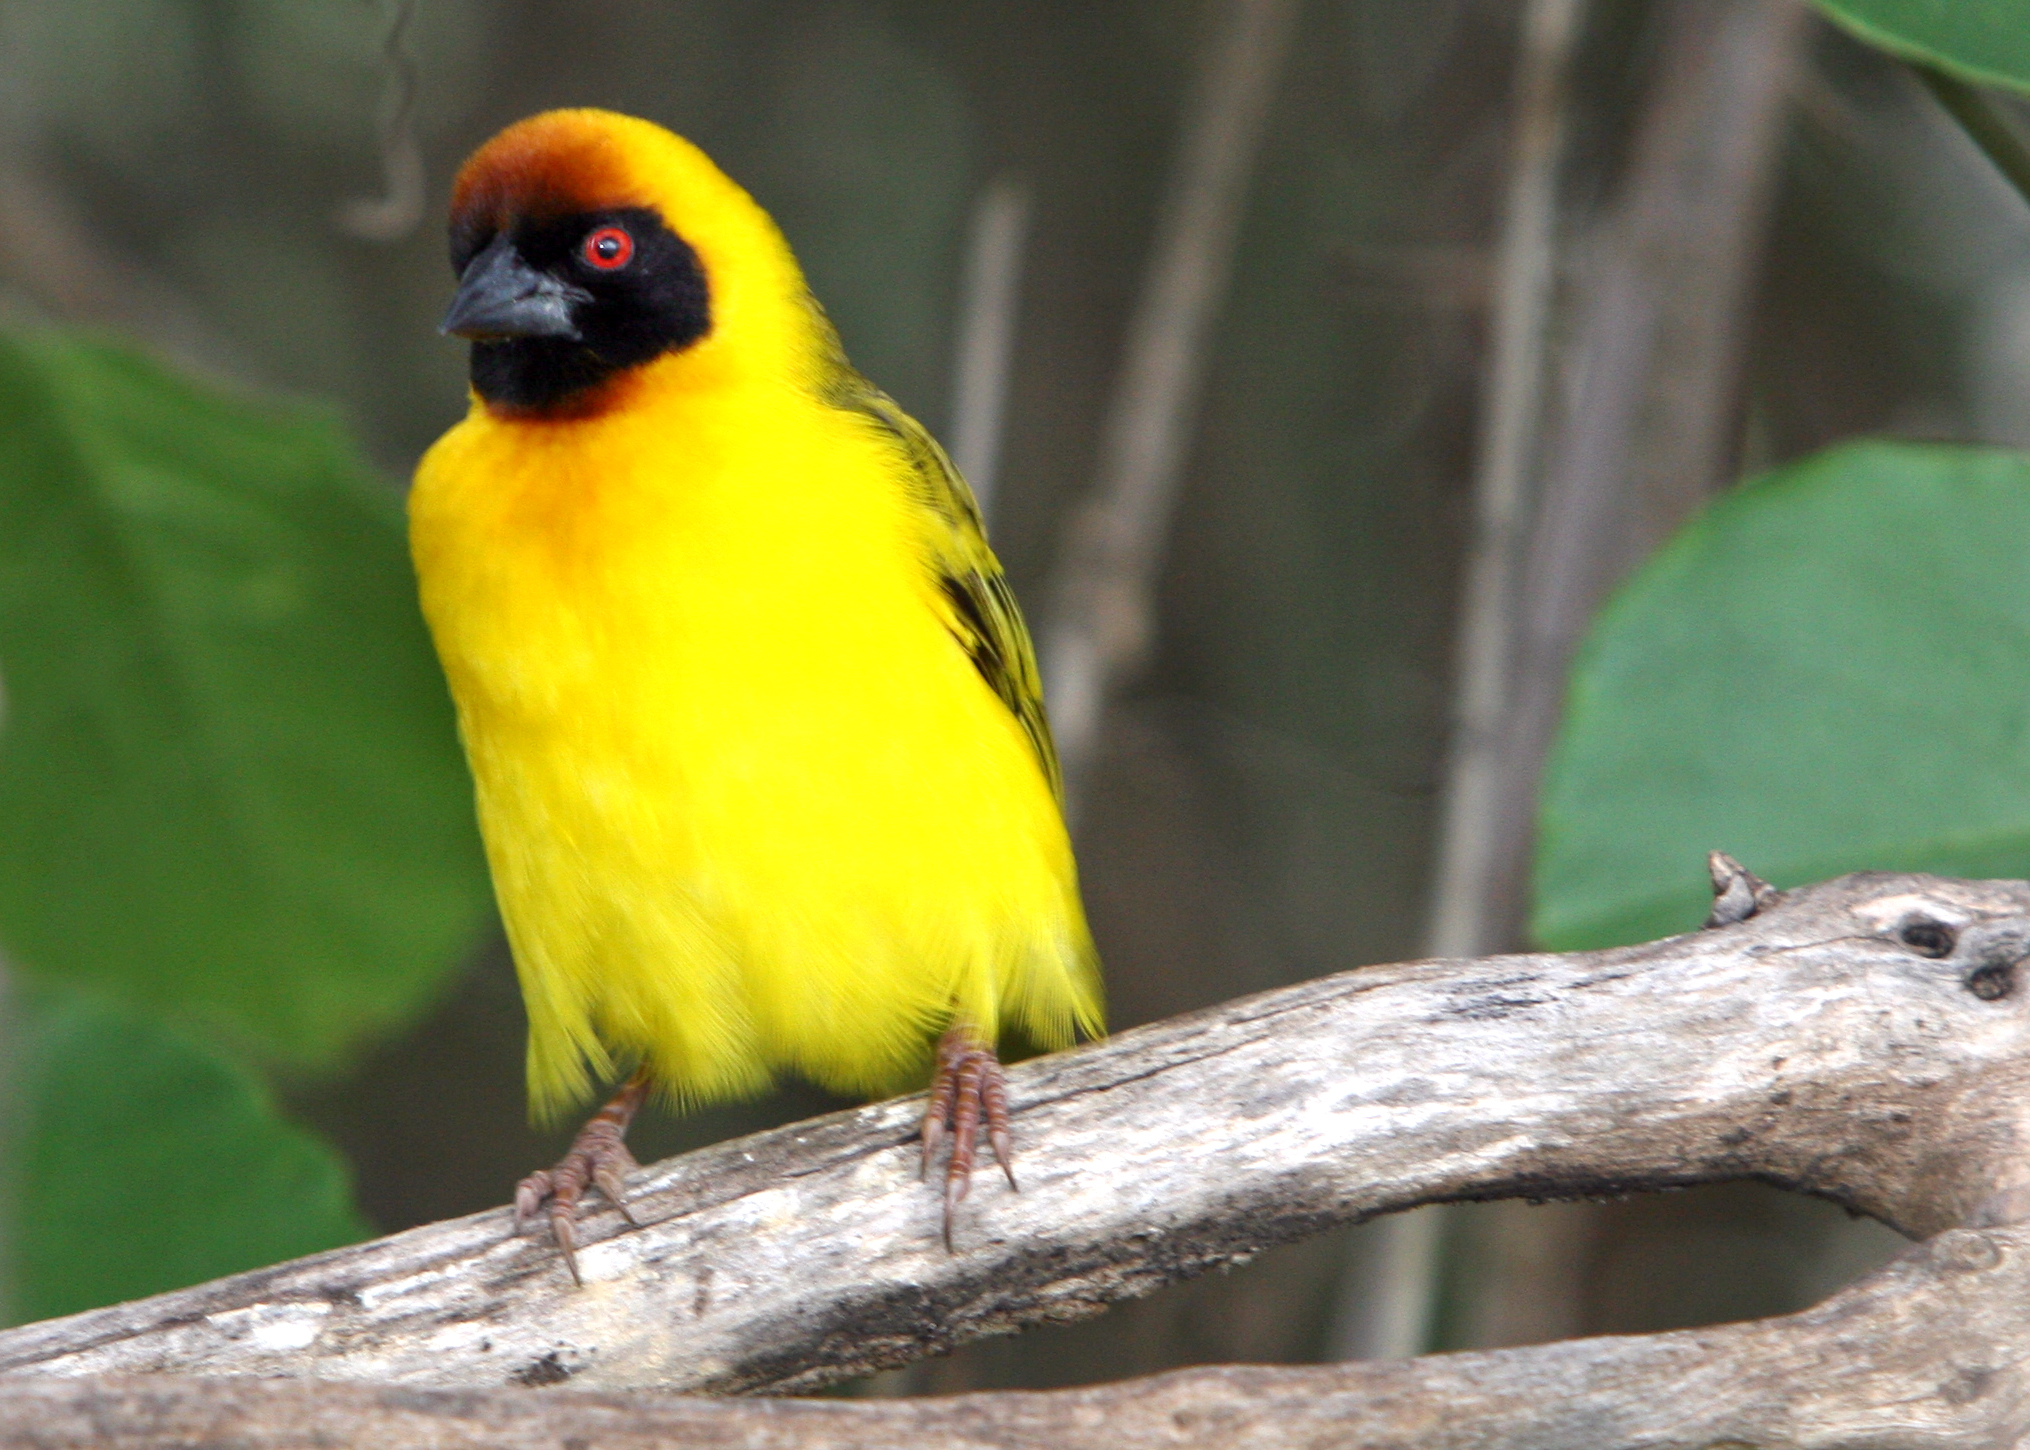 Http Commons Wikimedia Org Wiki File Yellow Bird At Olduvai Gorge Jpg